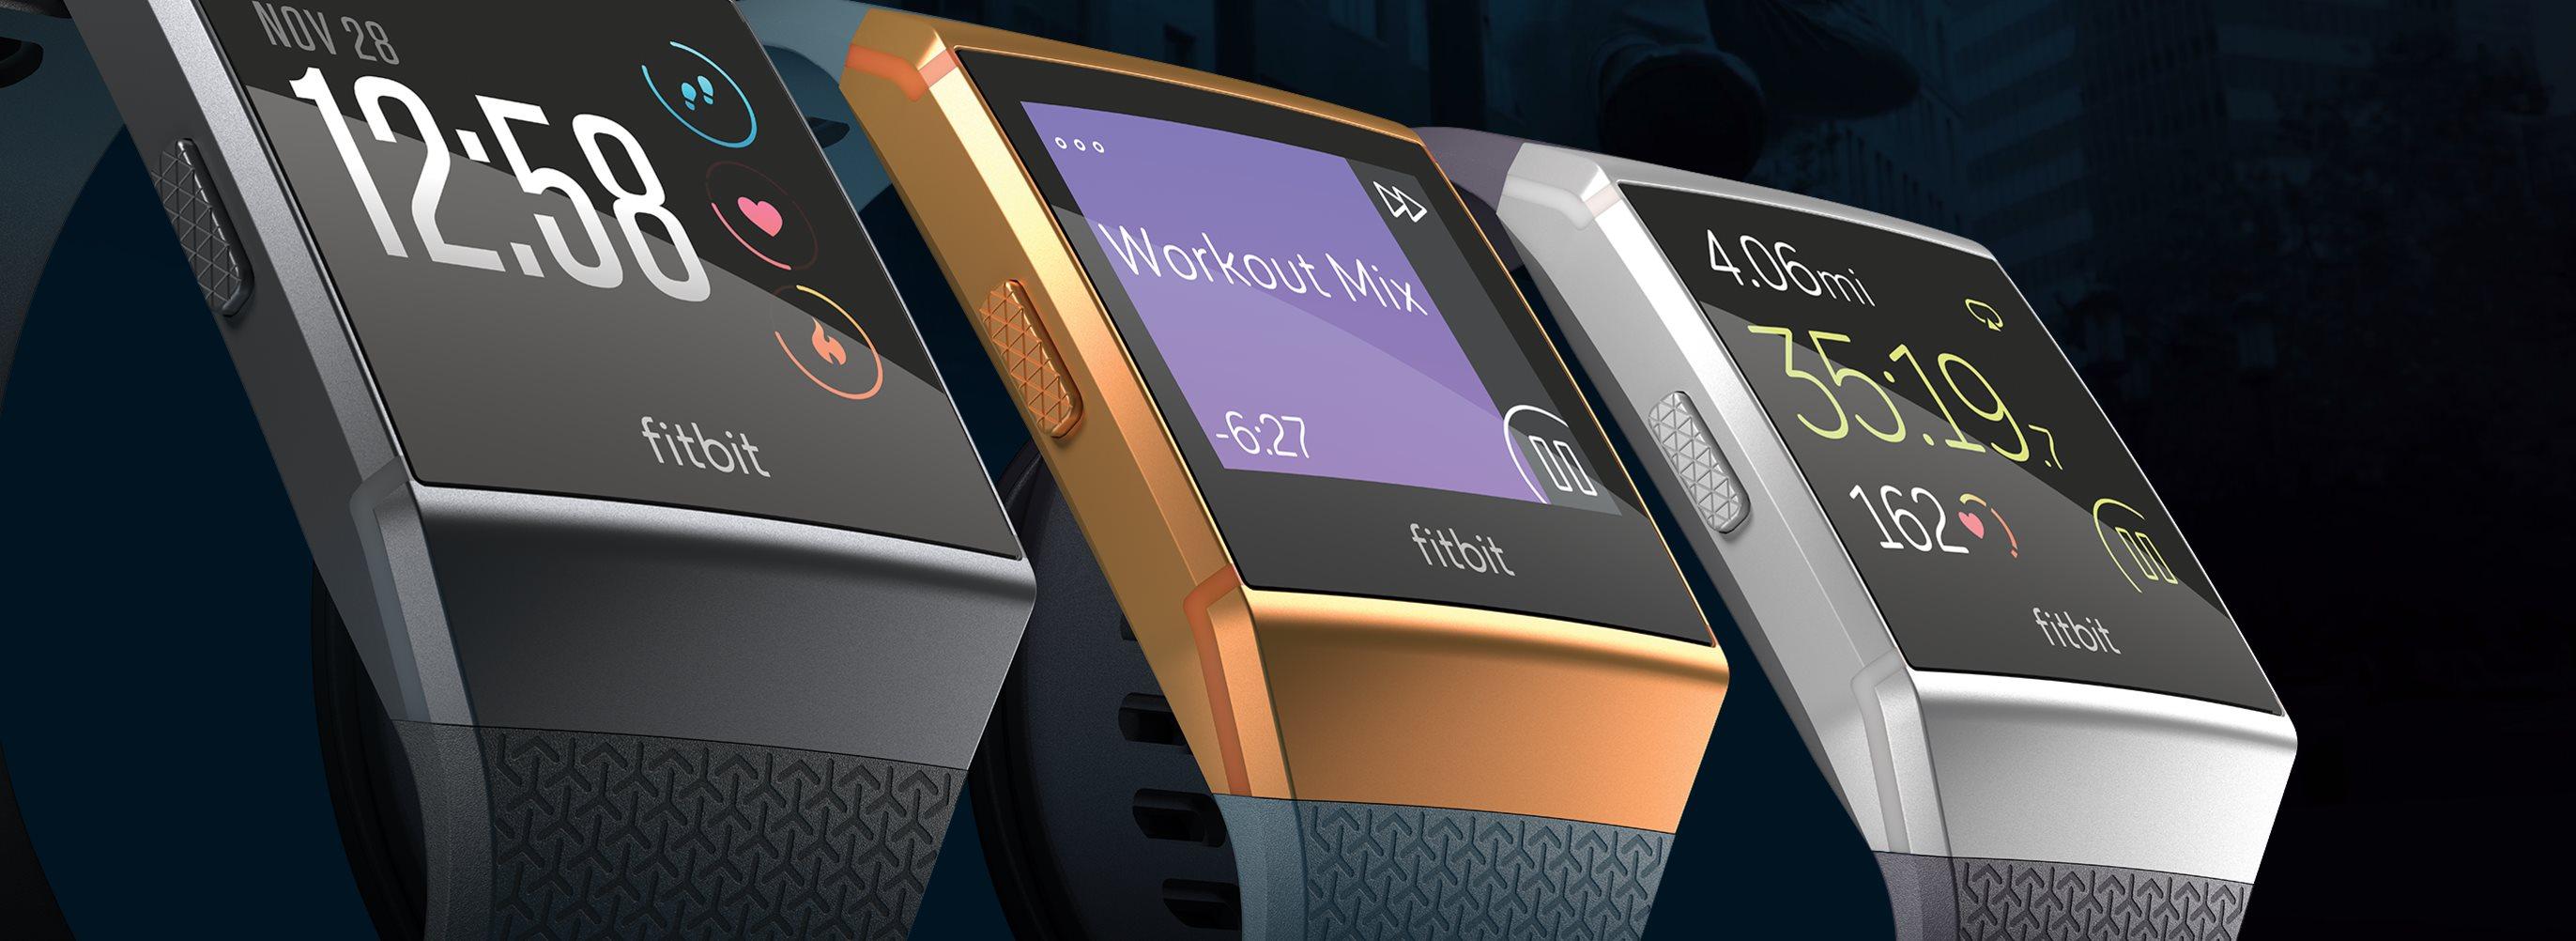 Fitbit's Ionic Smartwatch and Flyer Wireless Headphones